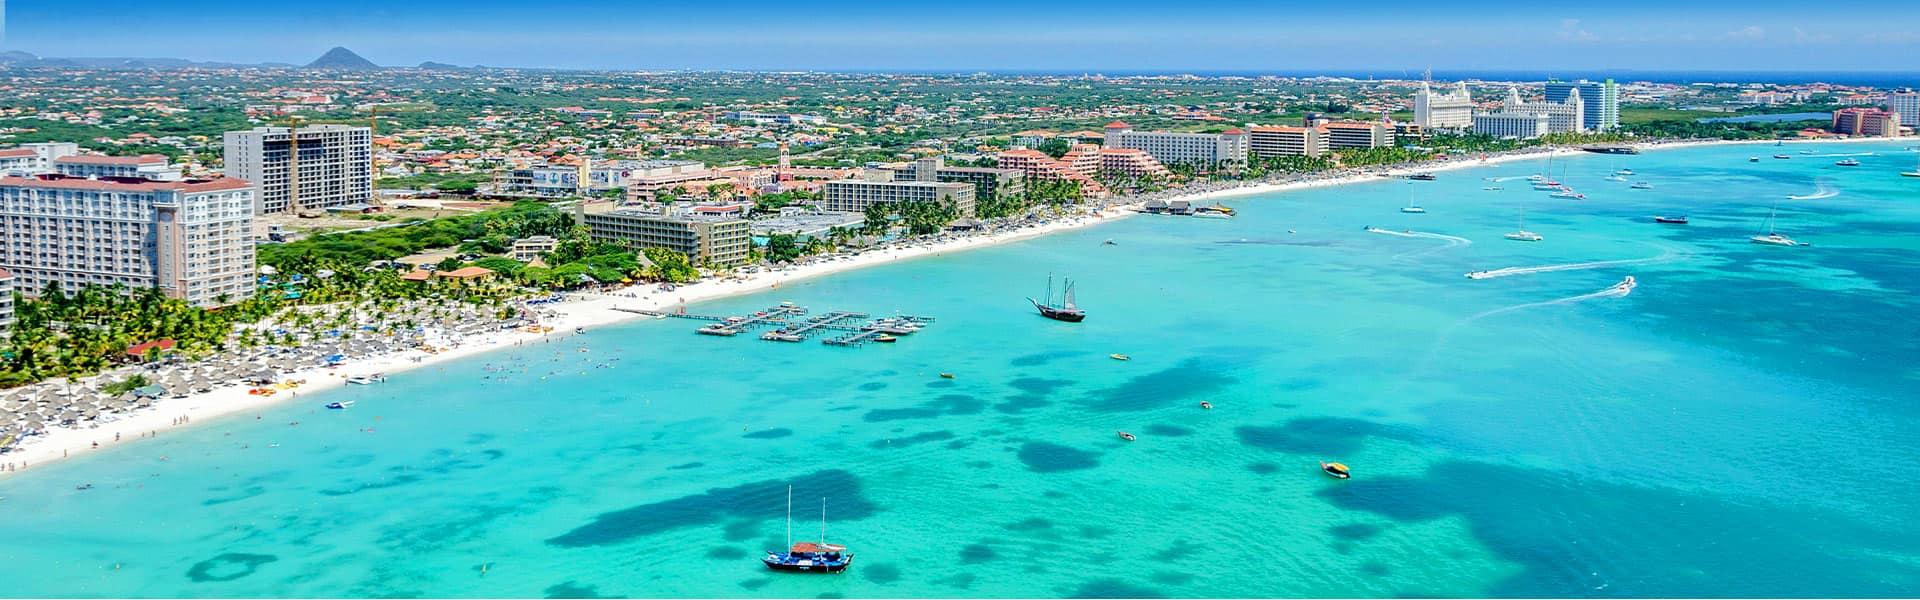 Panama Canal: Curacao & Aruba